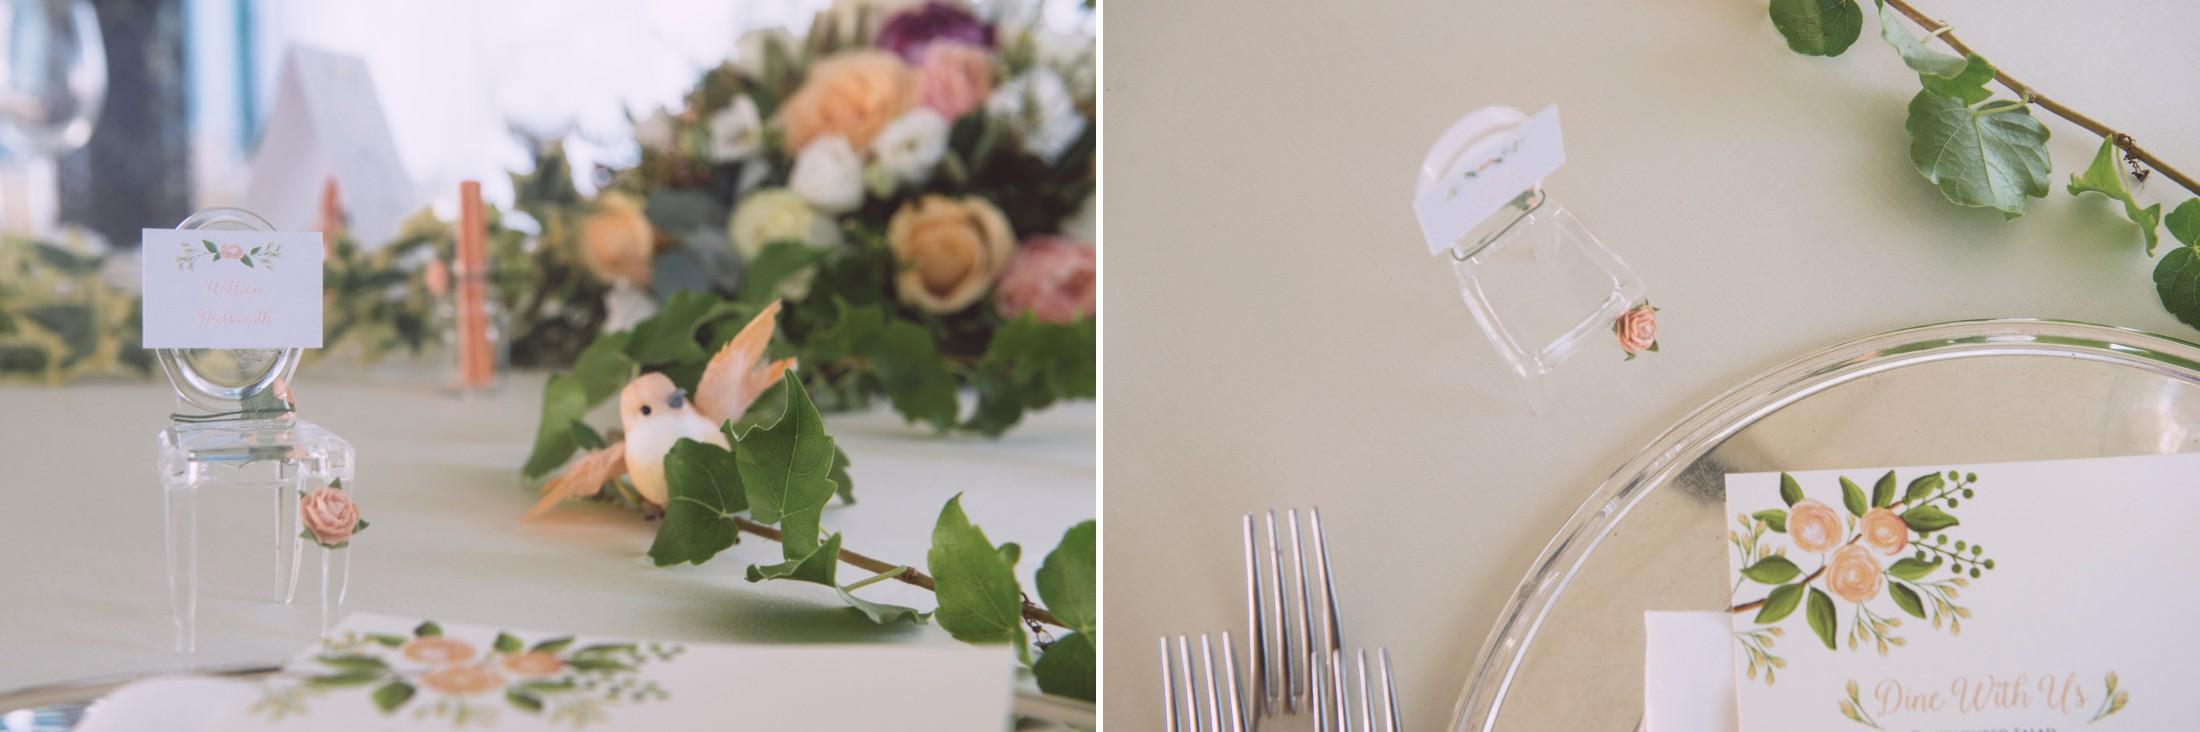 wedding in ravello table setting at villa eva